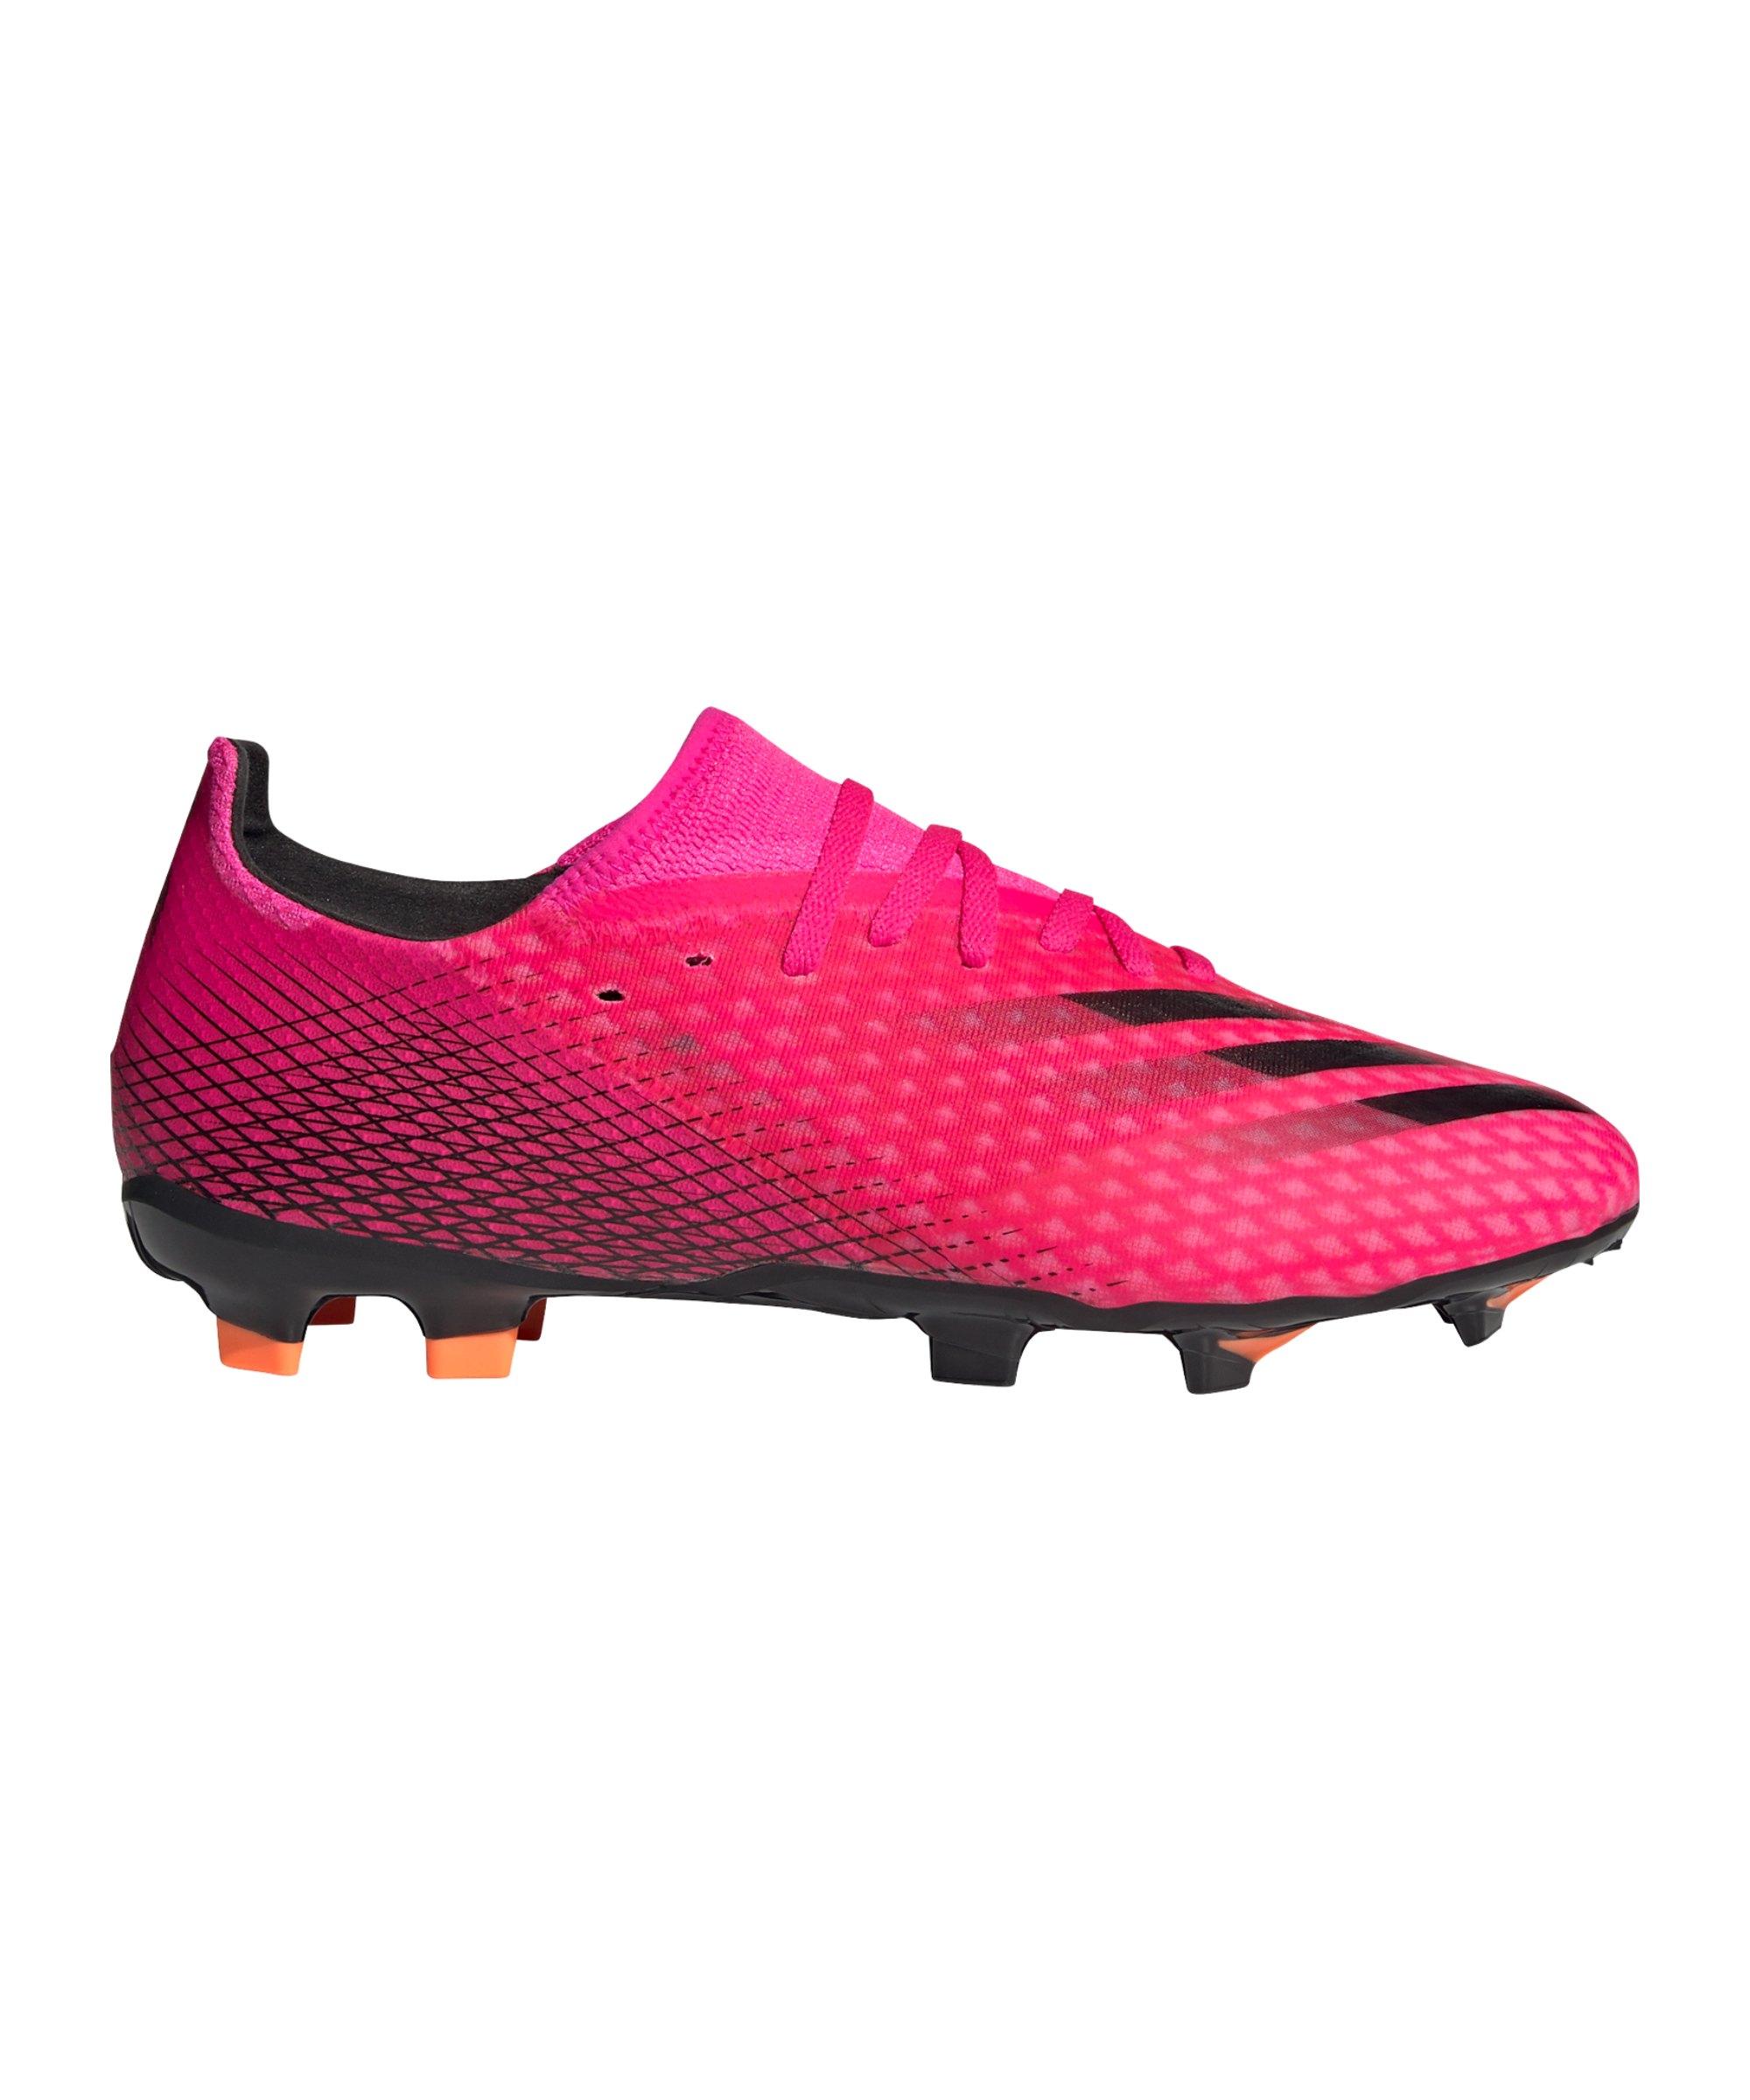 adidas X GHOSTED.3 FG Superspectral Pink Schwarz Orange - pink